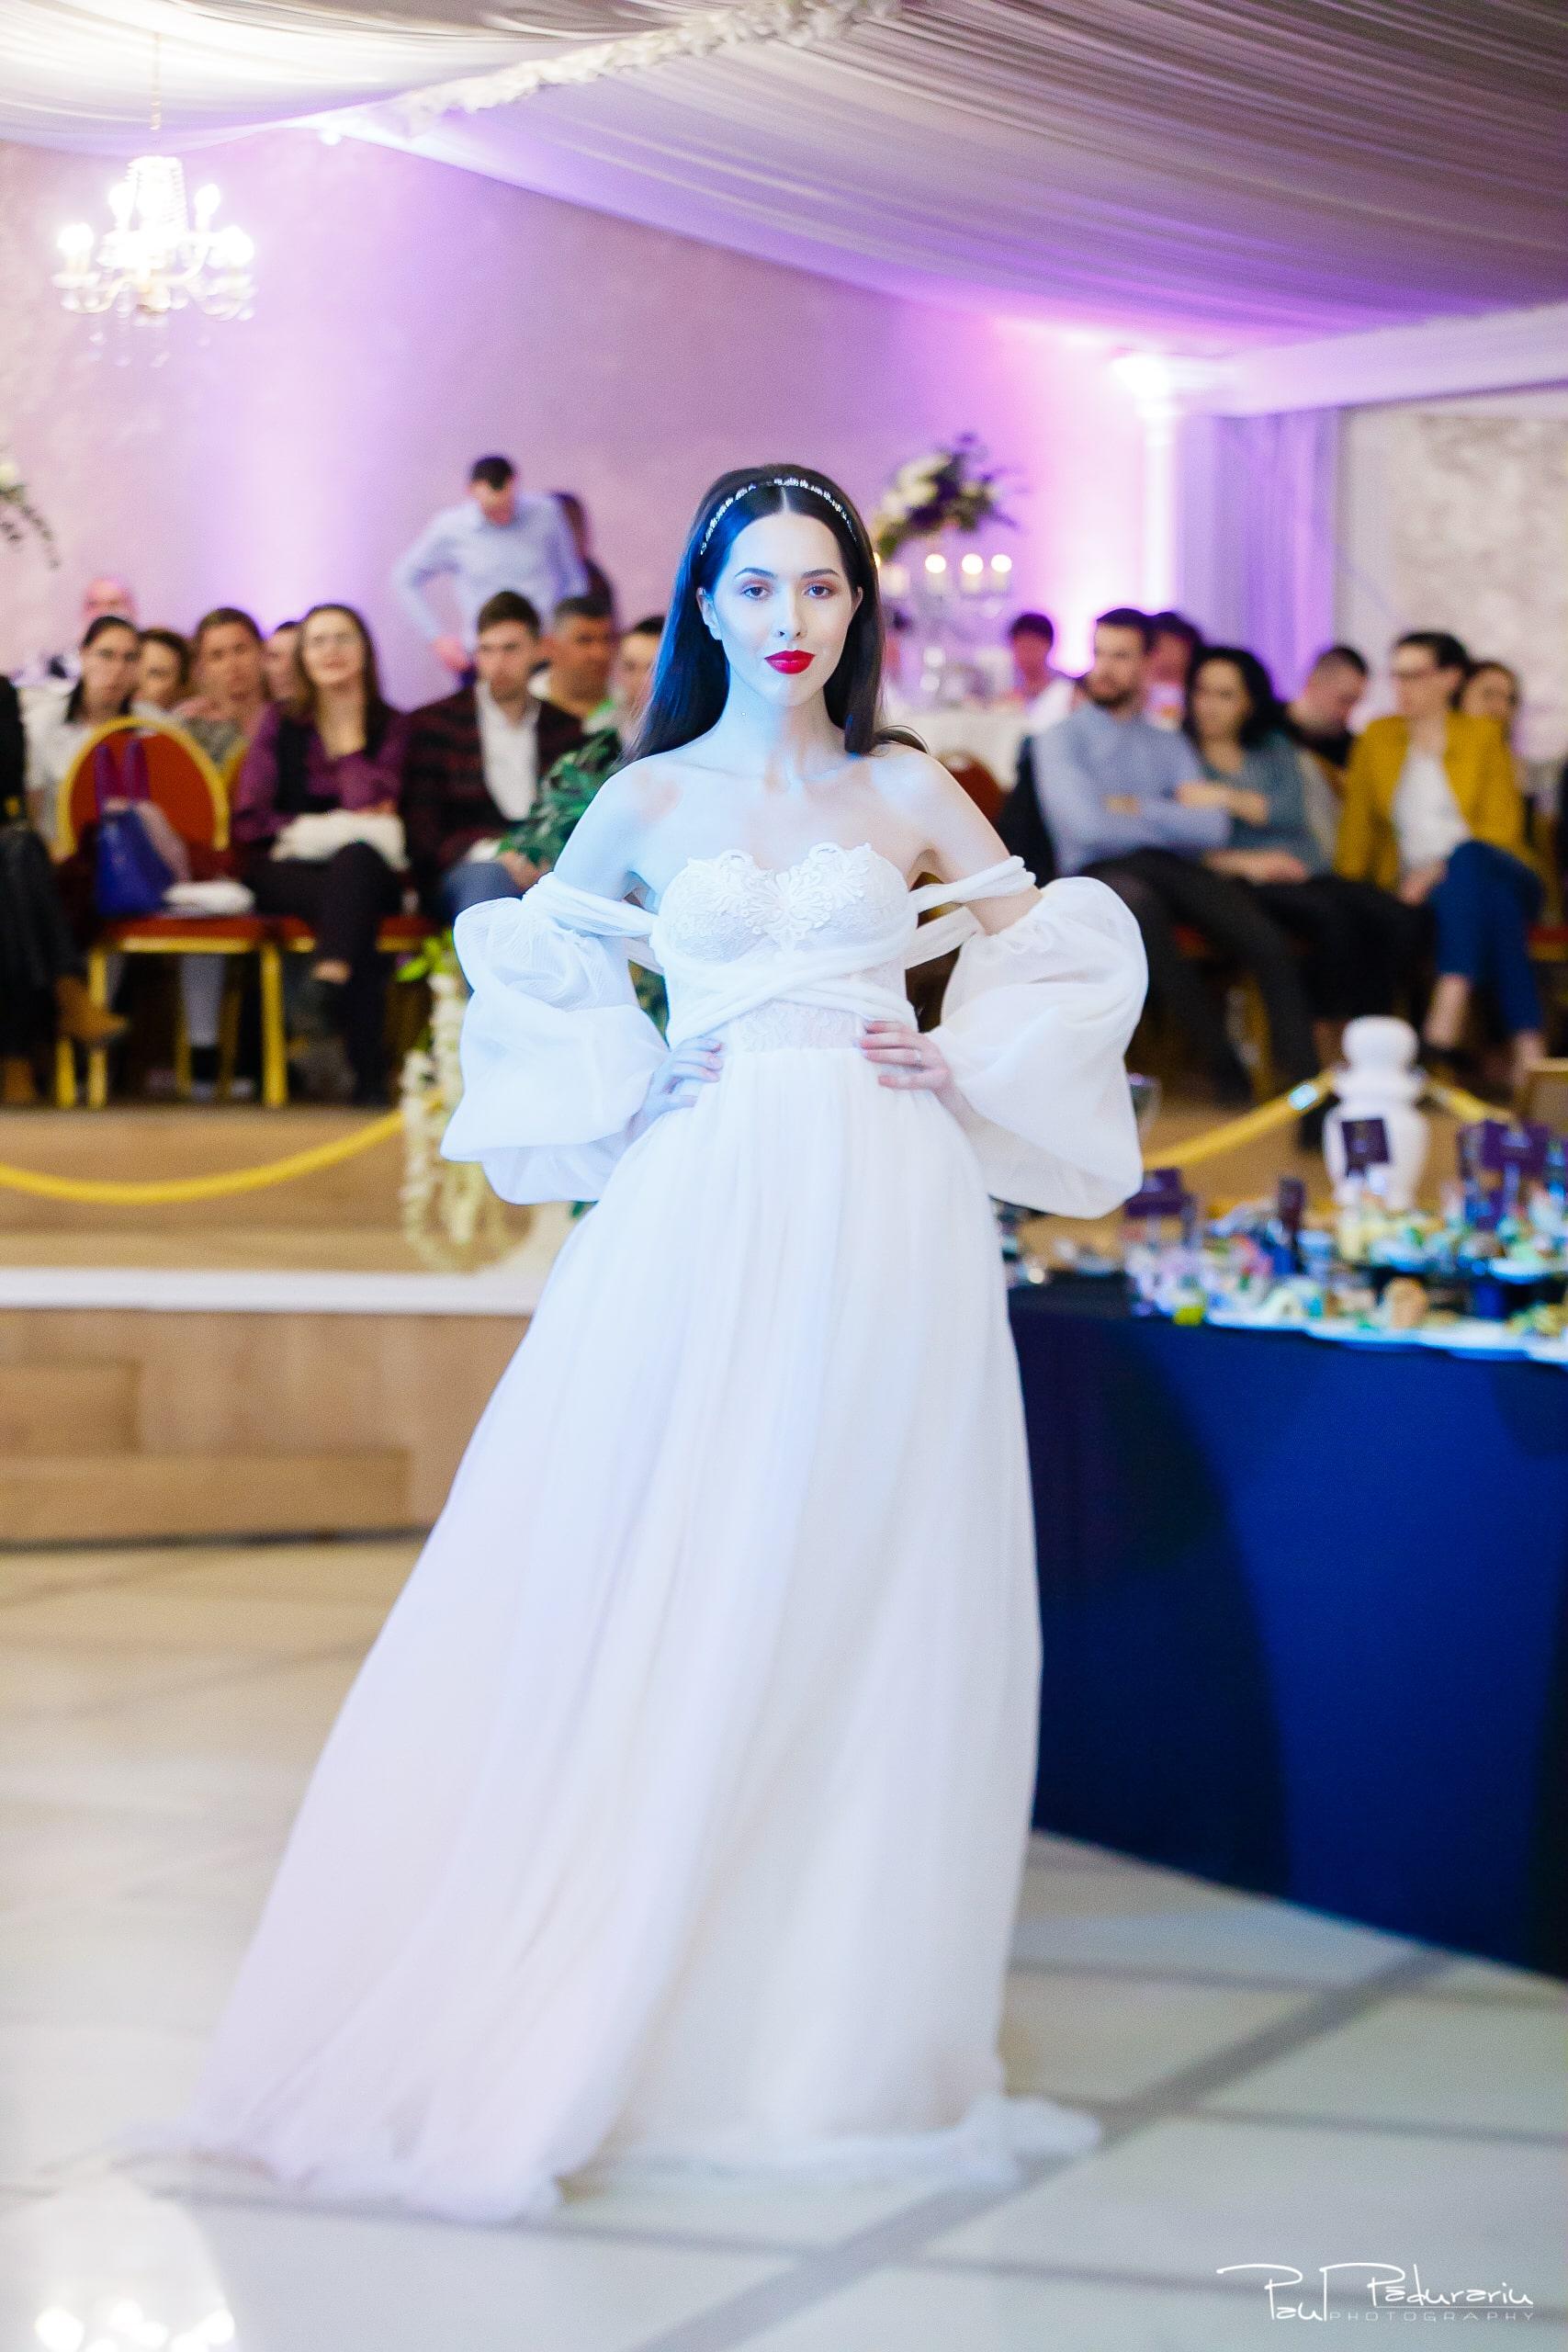 Modern Bride Edith Val colectie rochie mireasa 2019 - fotograf profesionist iasi paul padurariu | nunta iasi 7